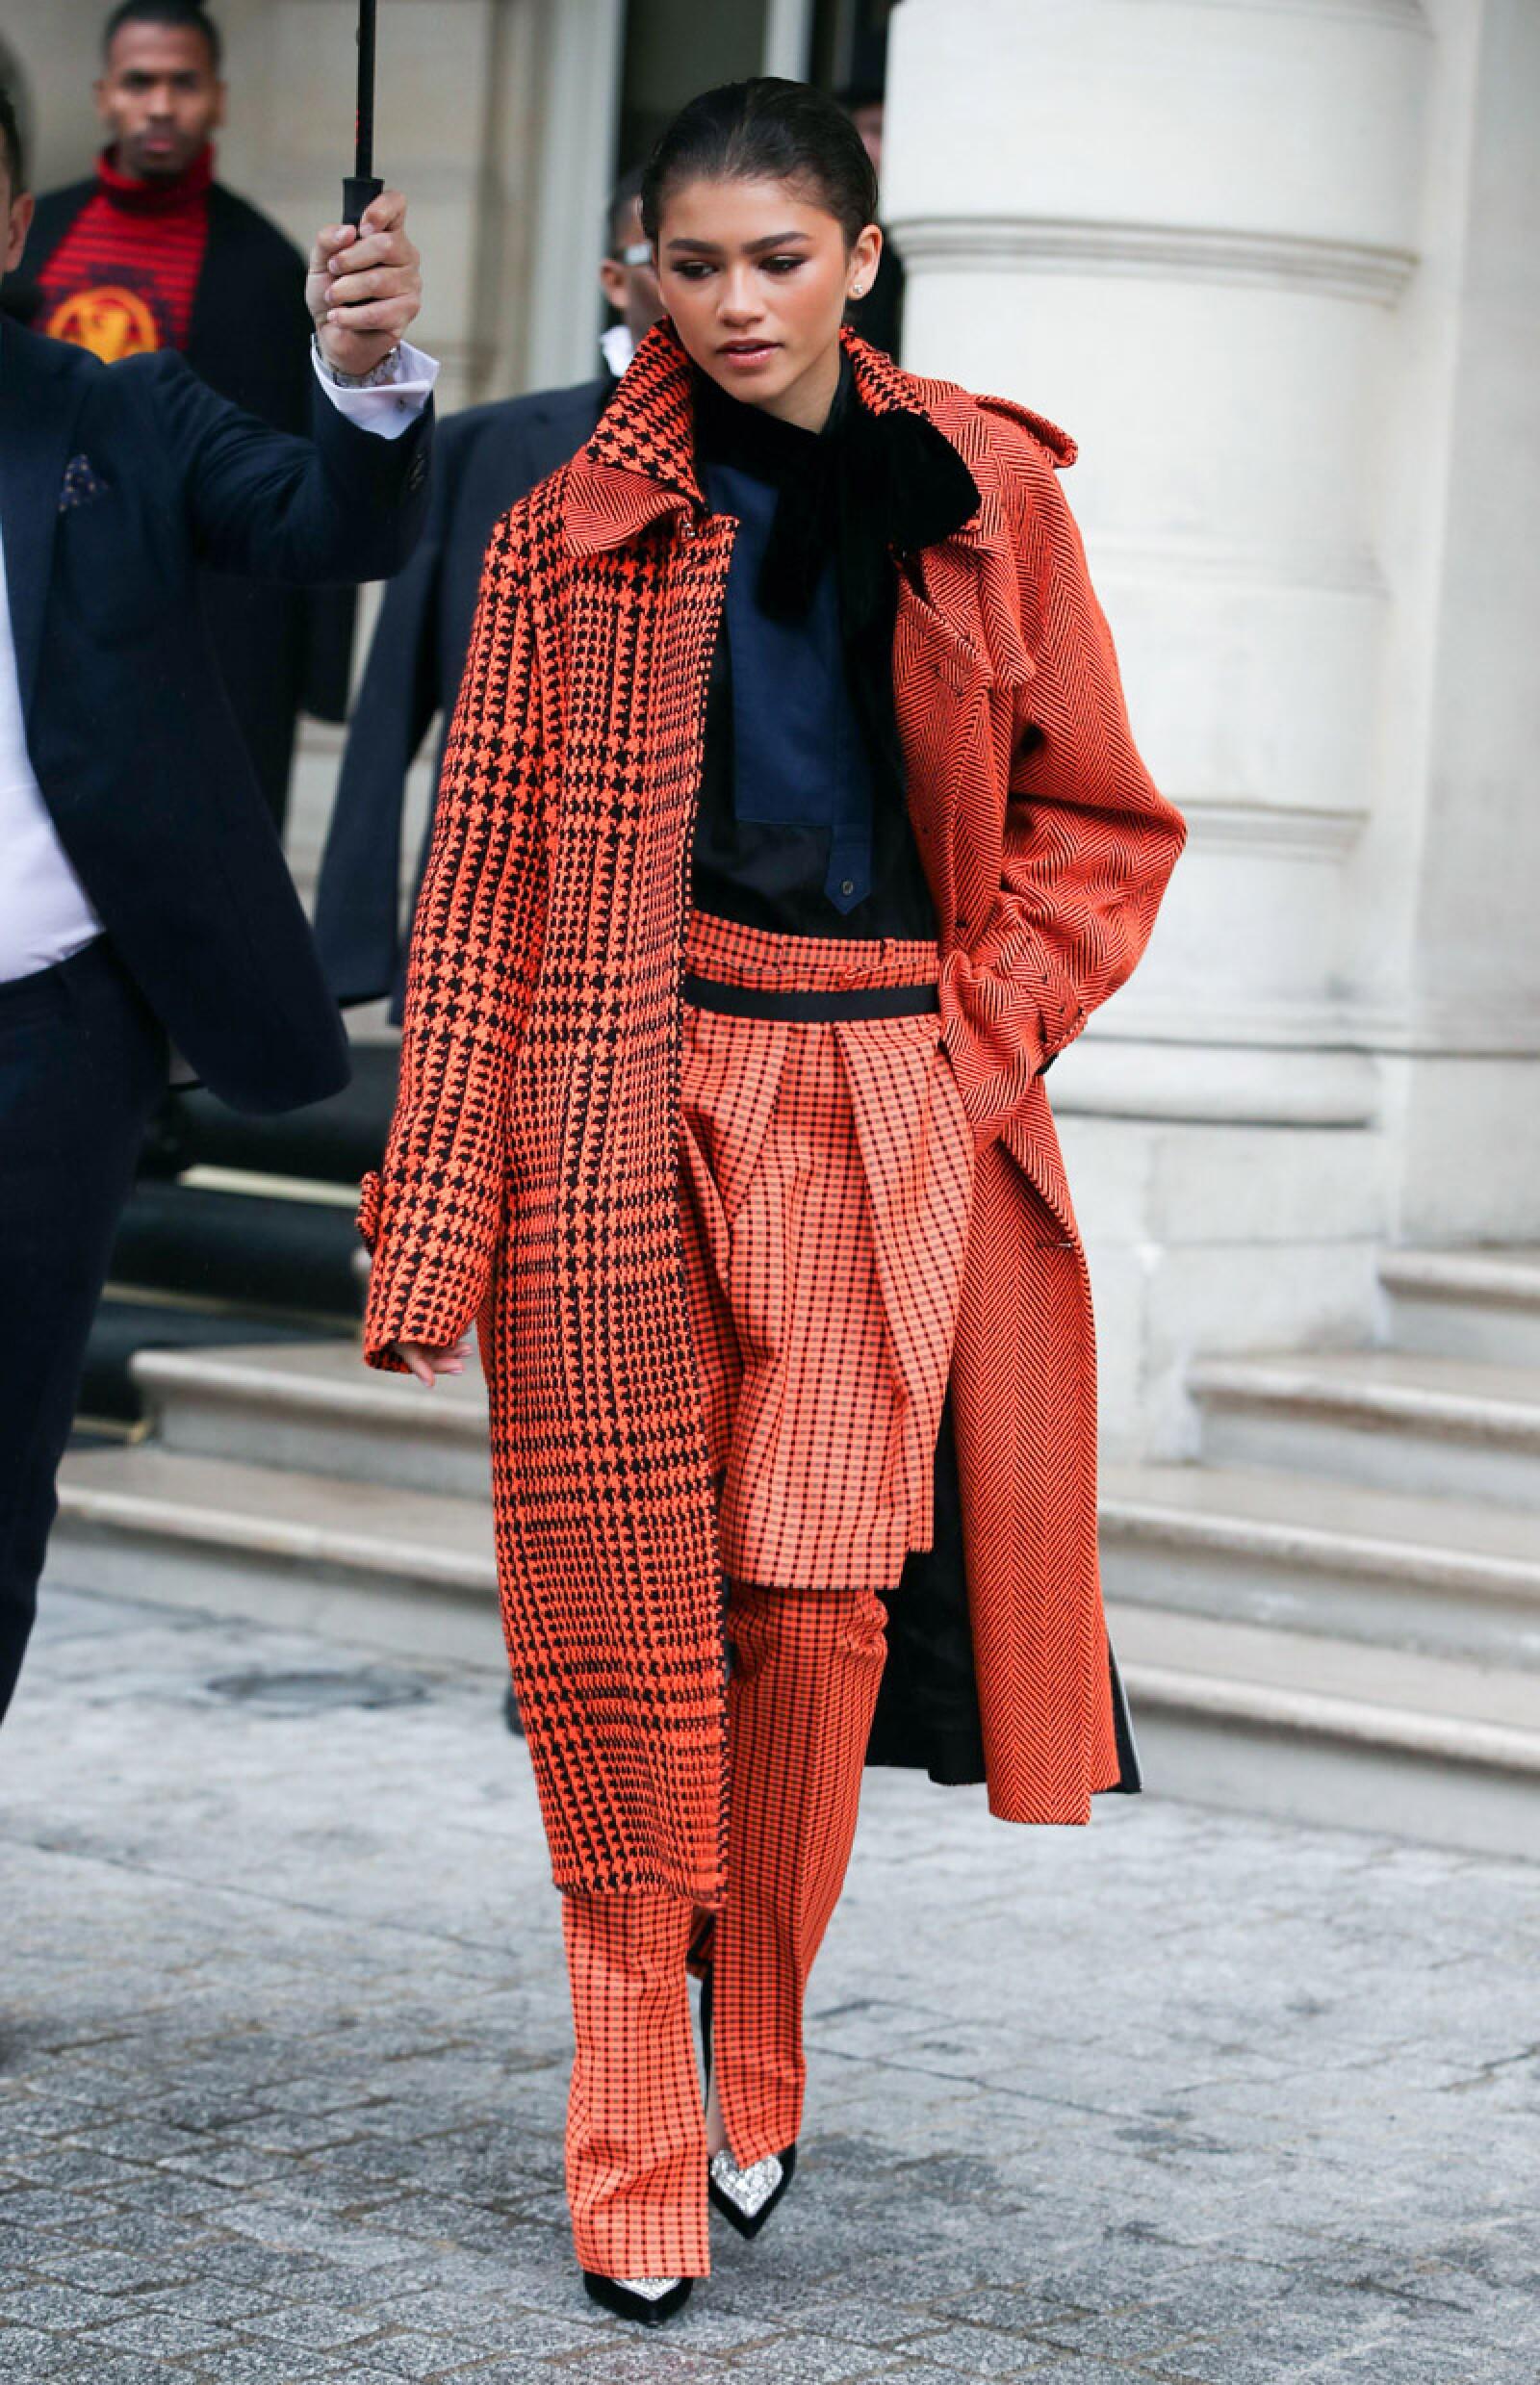 Zendaya out and about, Paris Fashion Week, France - 01 Mar 2019